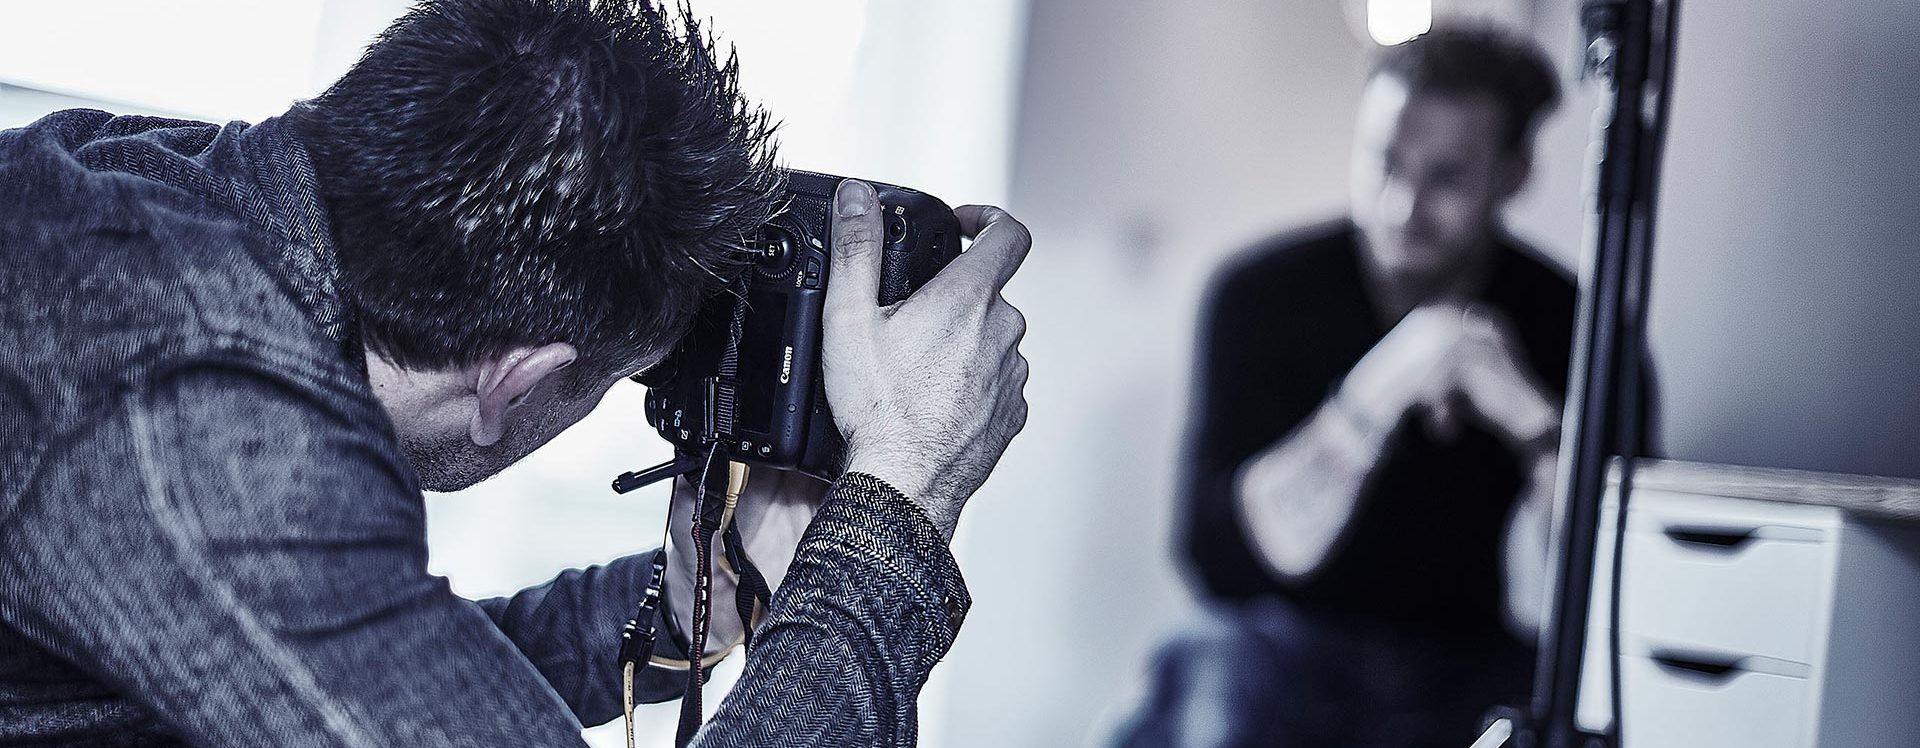 iMediate discipline fotografie